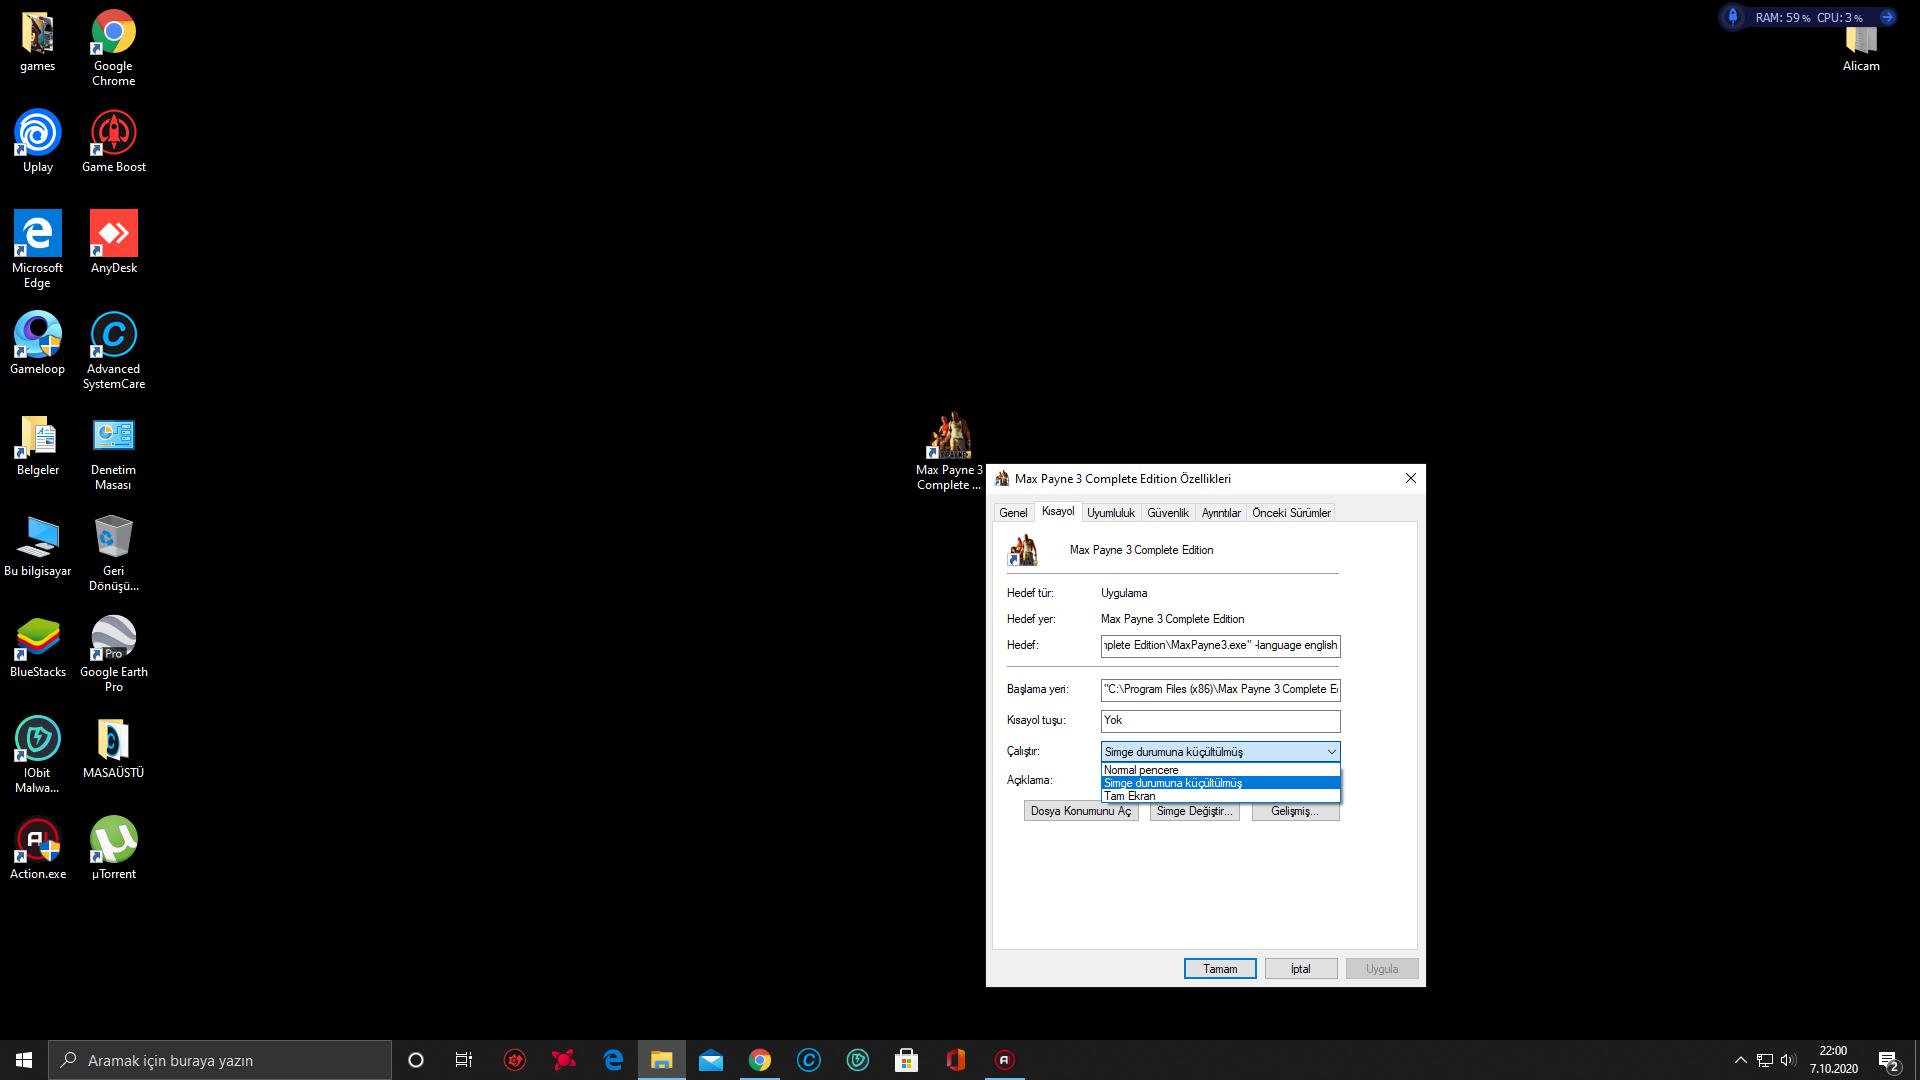 Desktop 7-10-2020 22-00-50-957.png